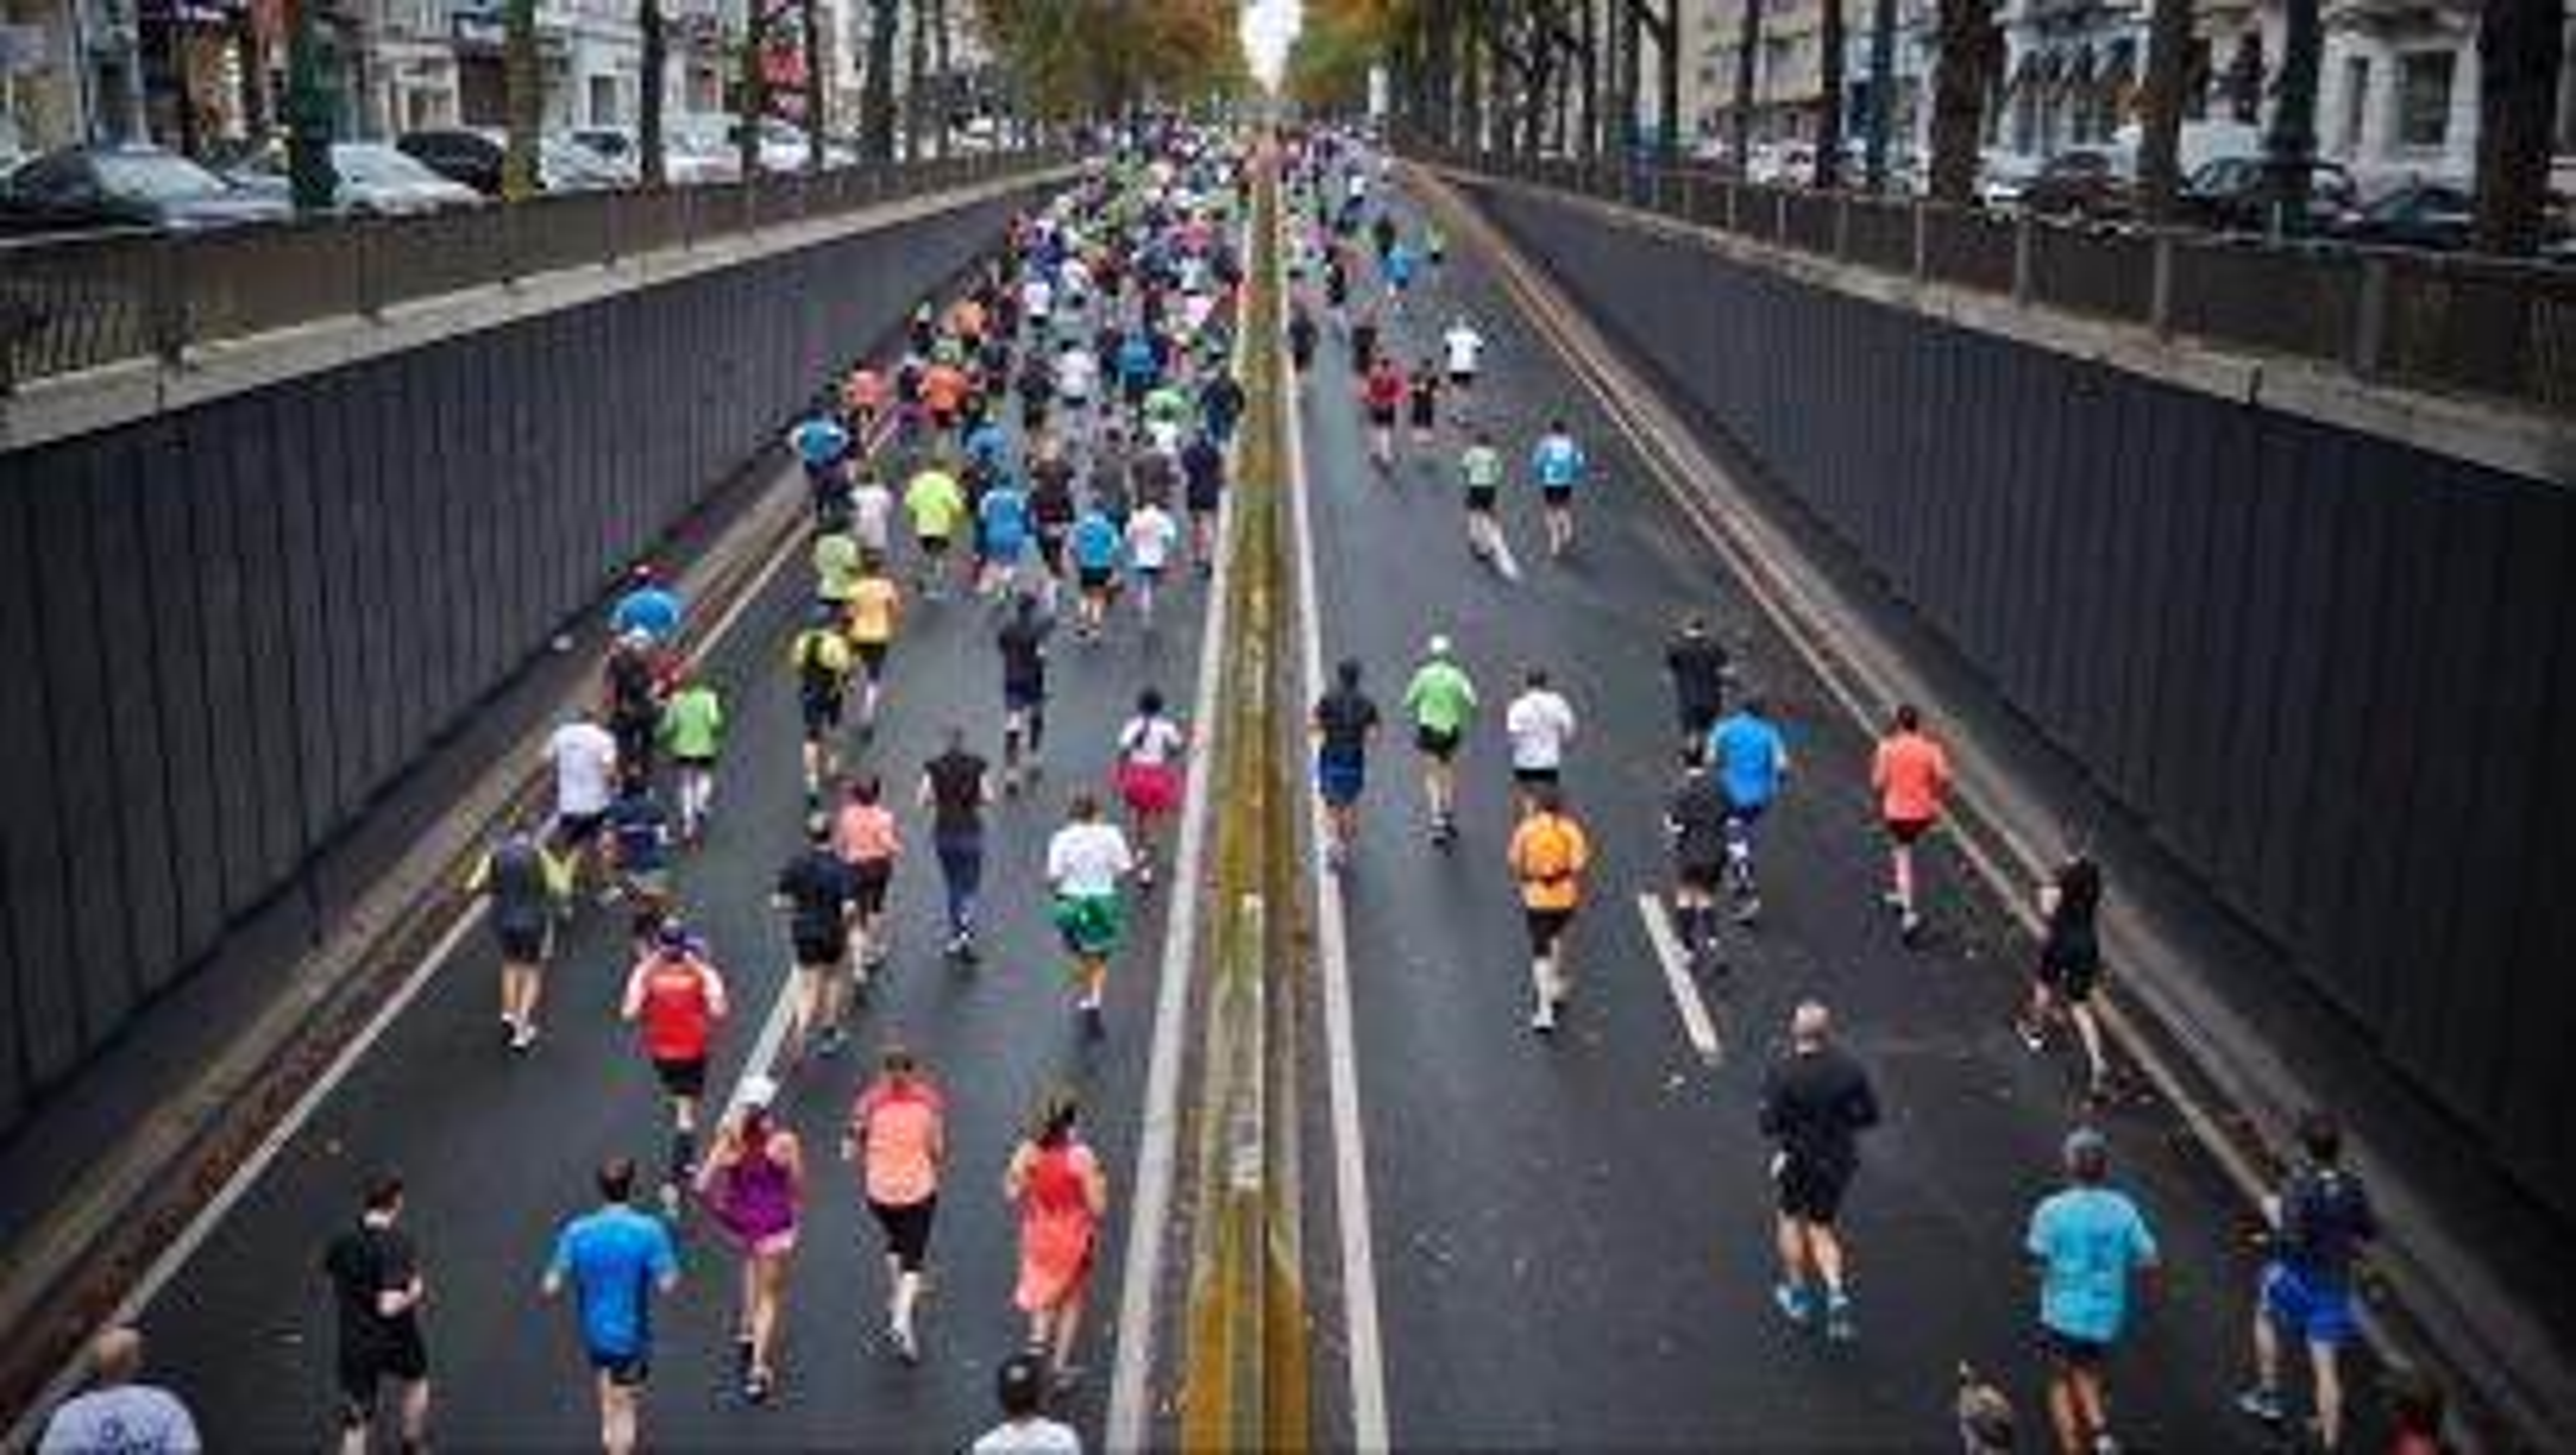 https://unsplash.com/search/marathon?photo=NPFu4GfFZ7E